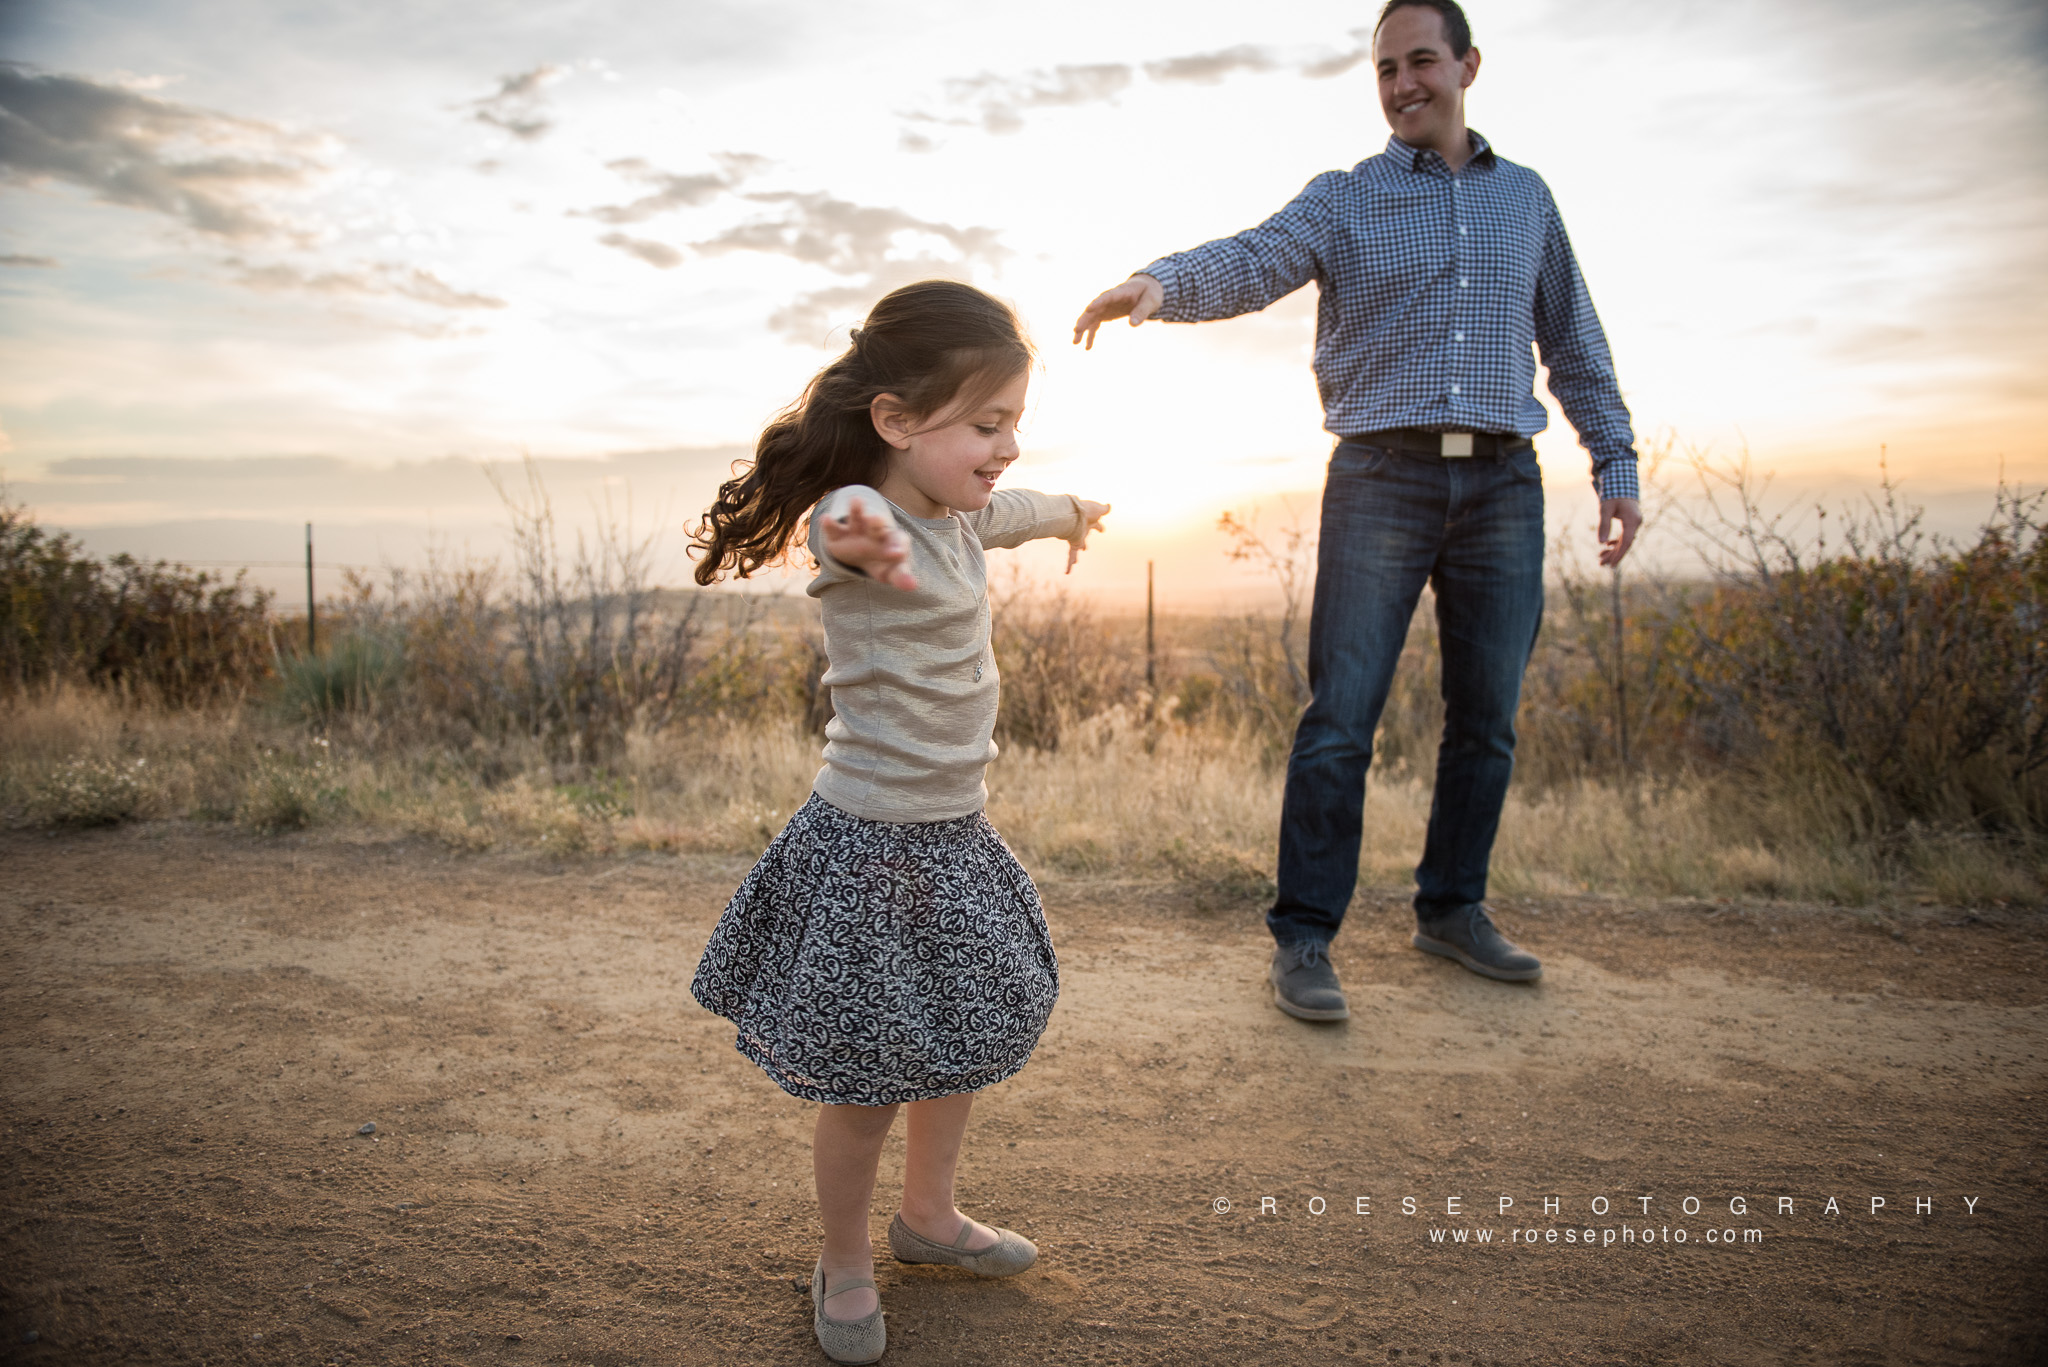 C.-Roese-Ramp-Roese-Photography-LLC.-Bennett-Family-19.jpg